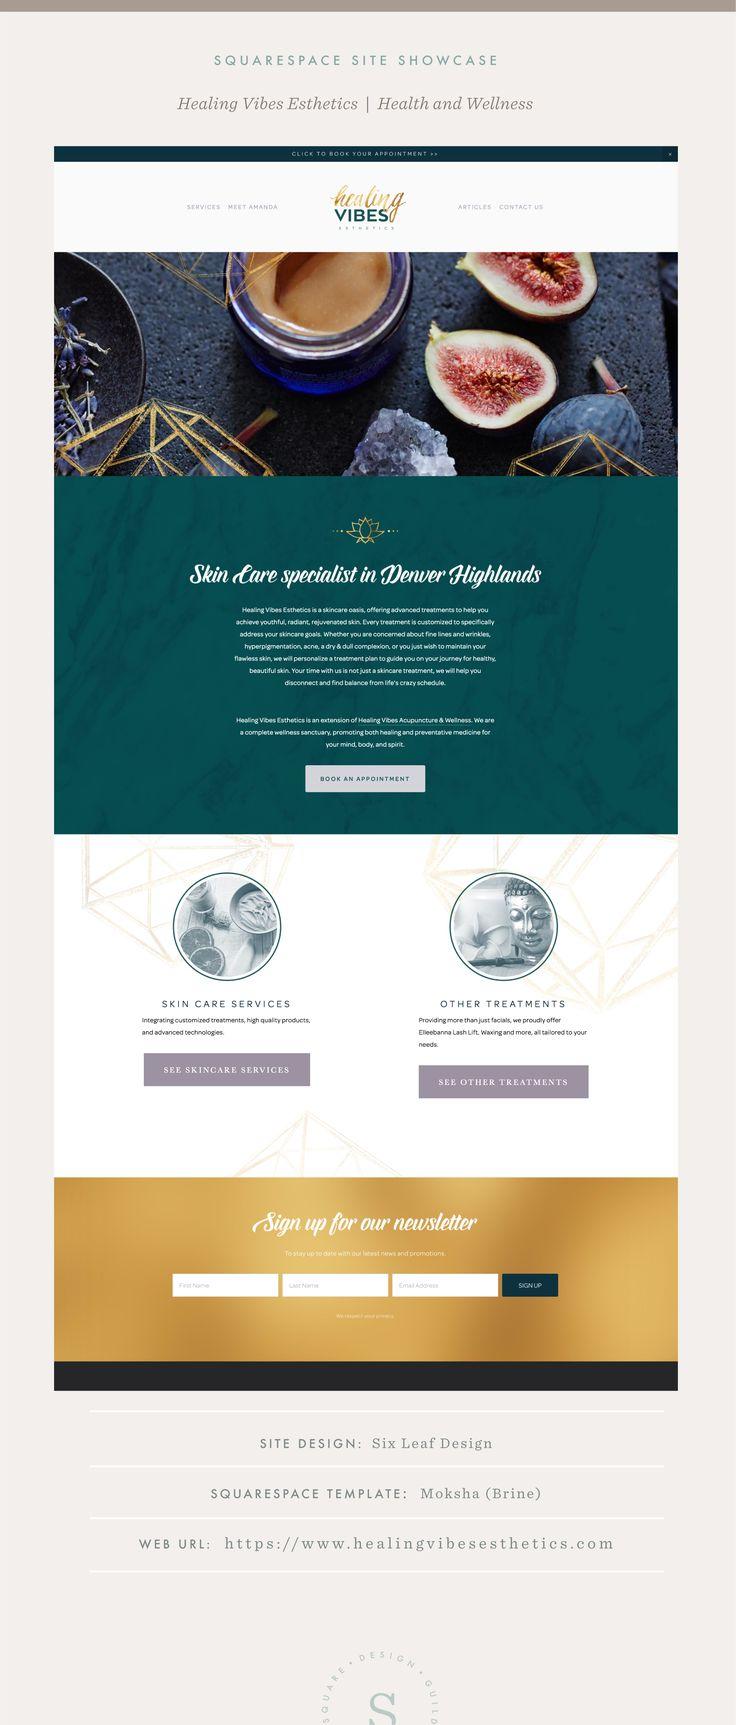 Site Showcase Healing Vibes Esthetics Healing